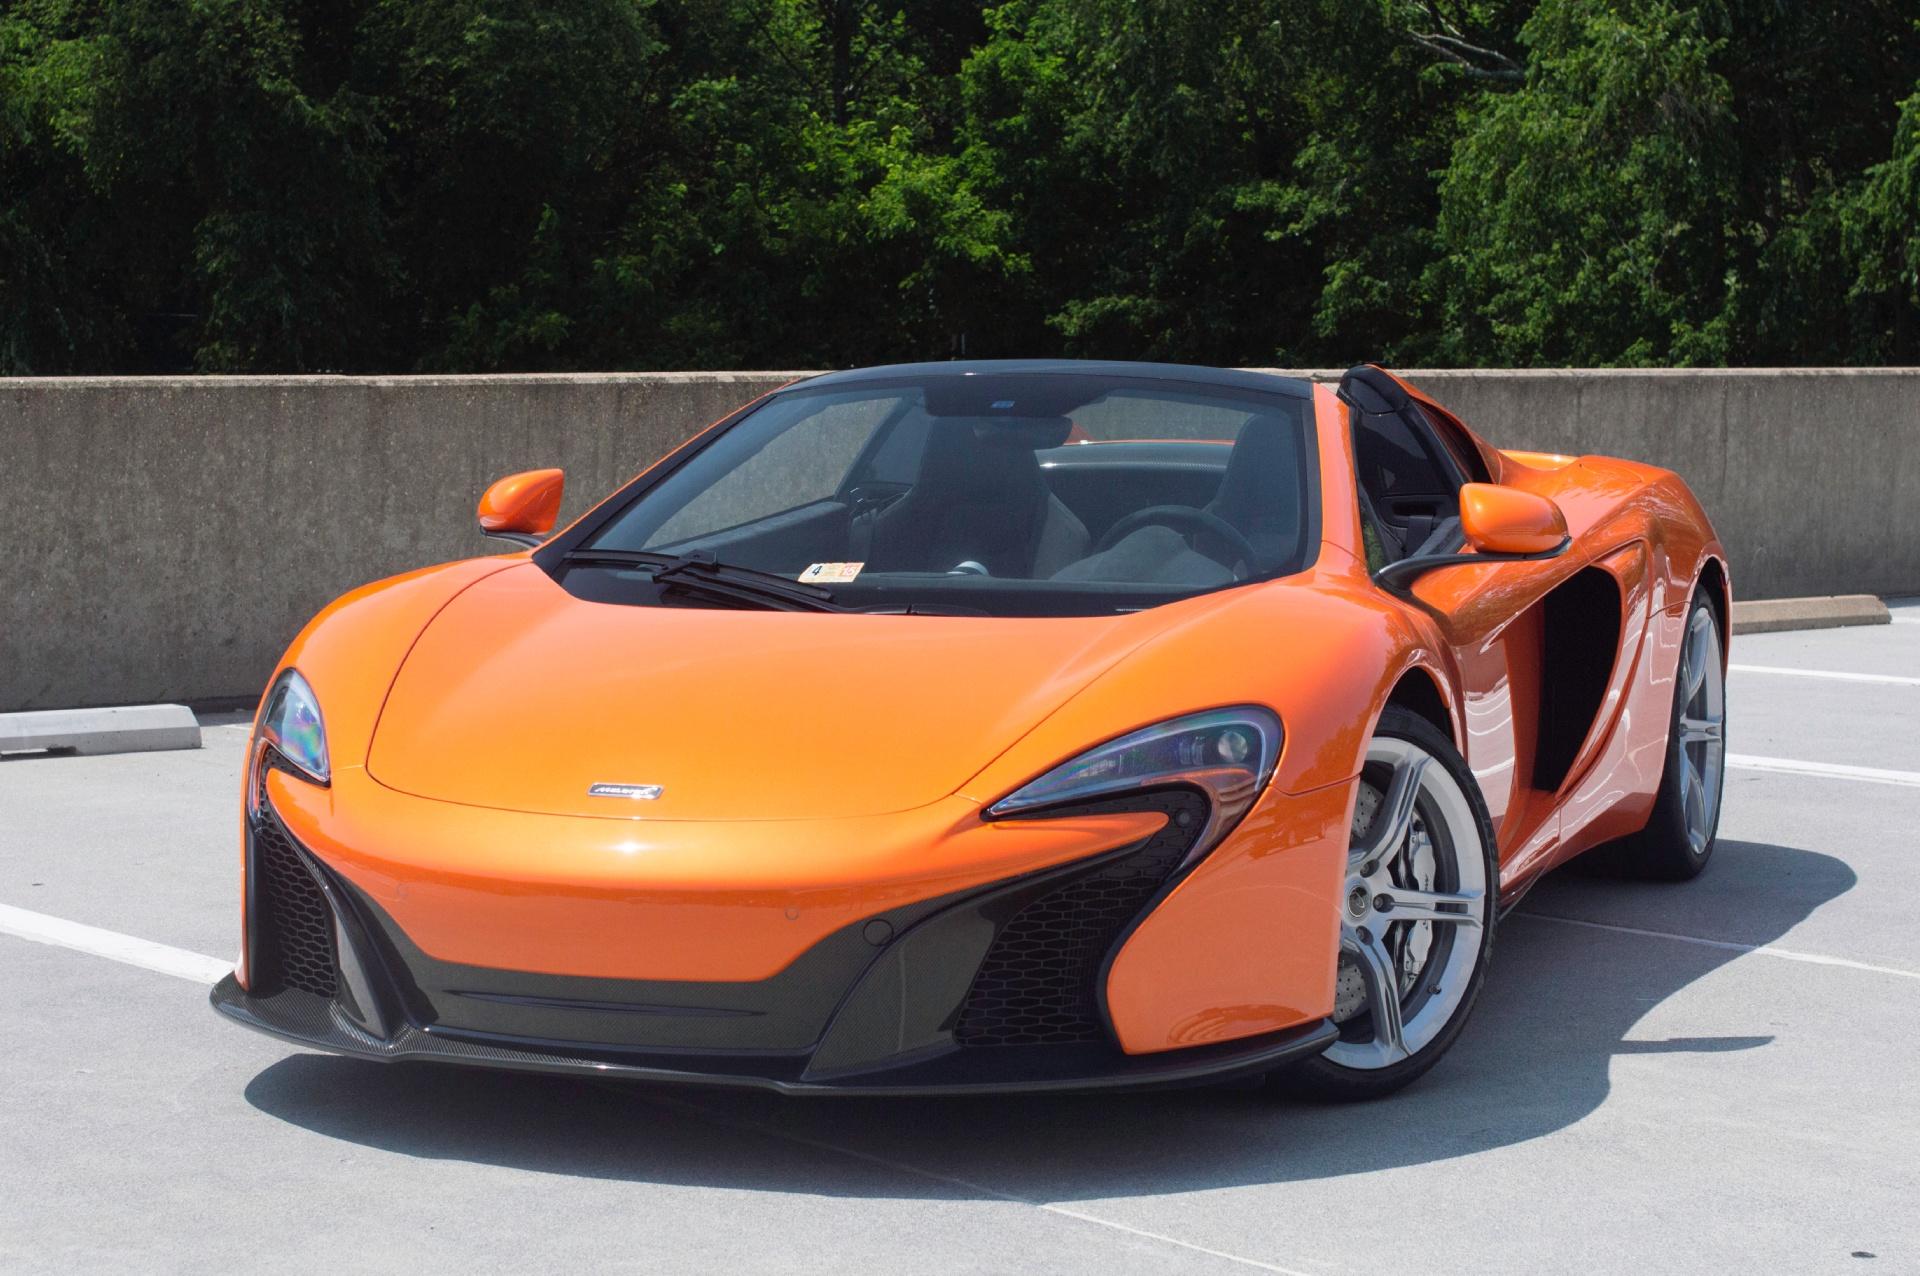 https://www.exclusiveautomotivegroup.com/galleria_images/78/78_main_l.jpg